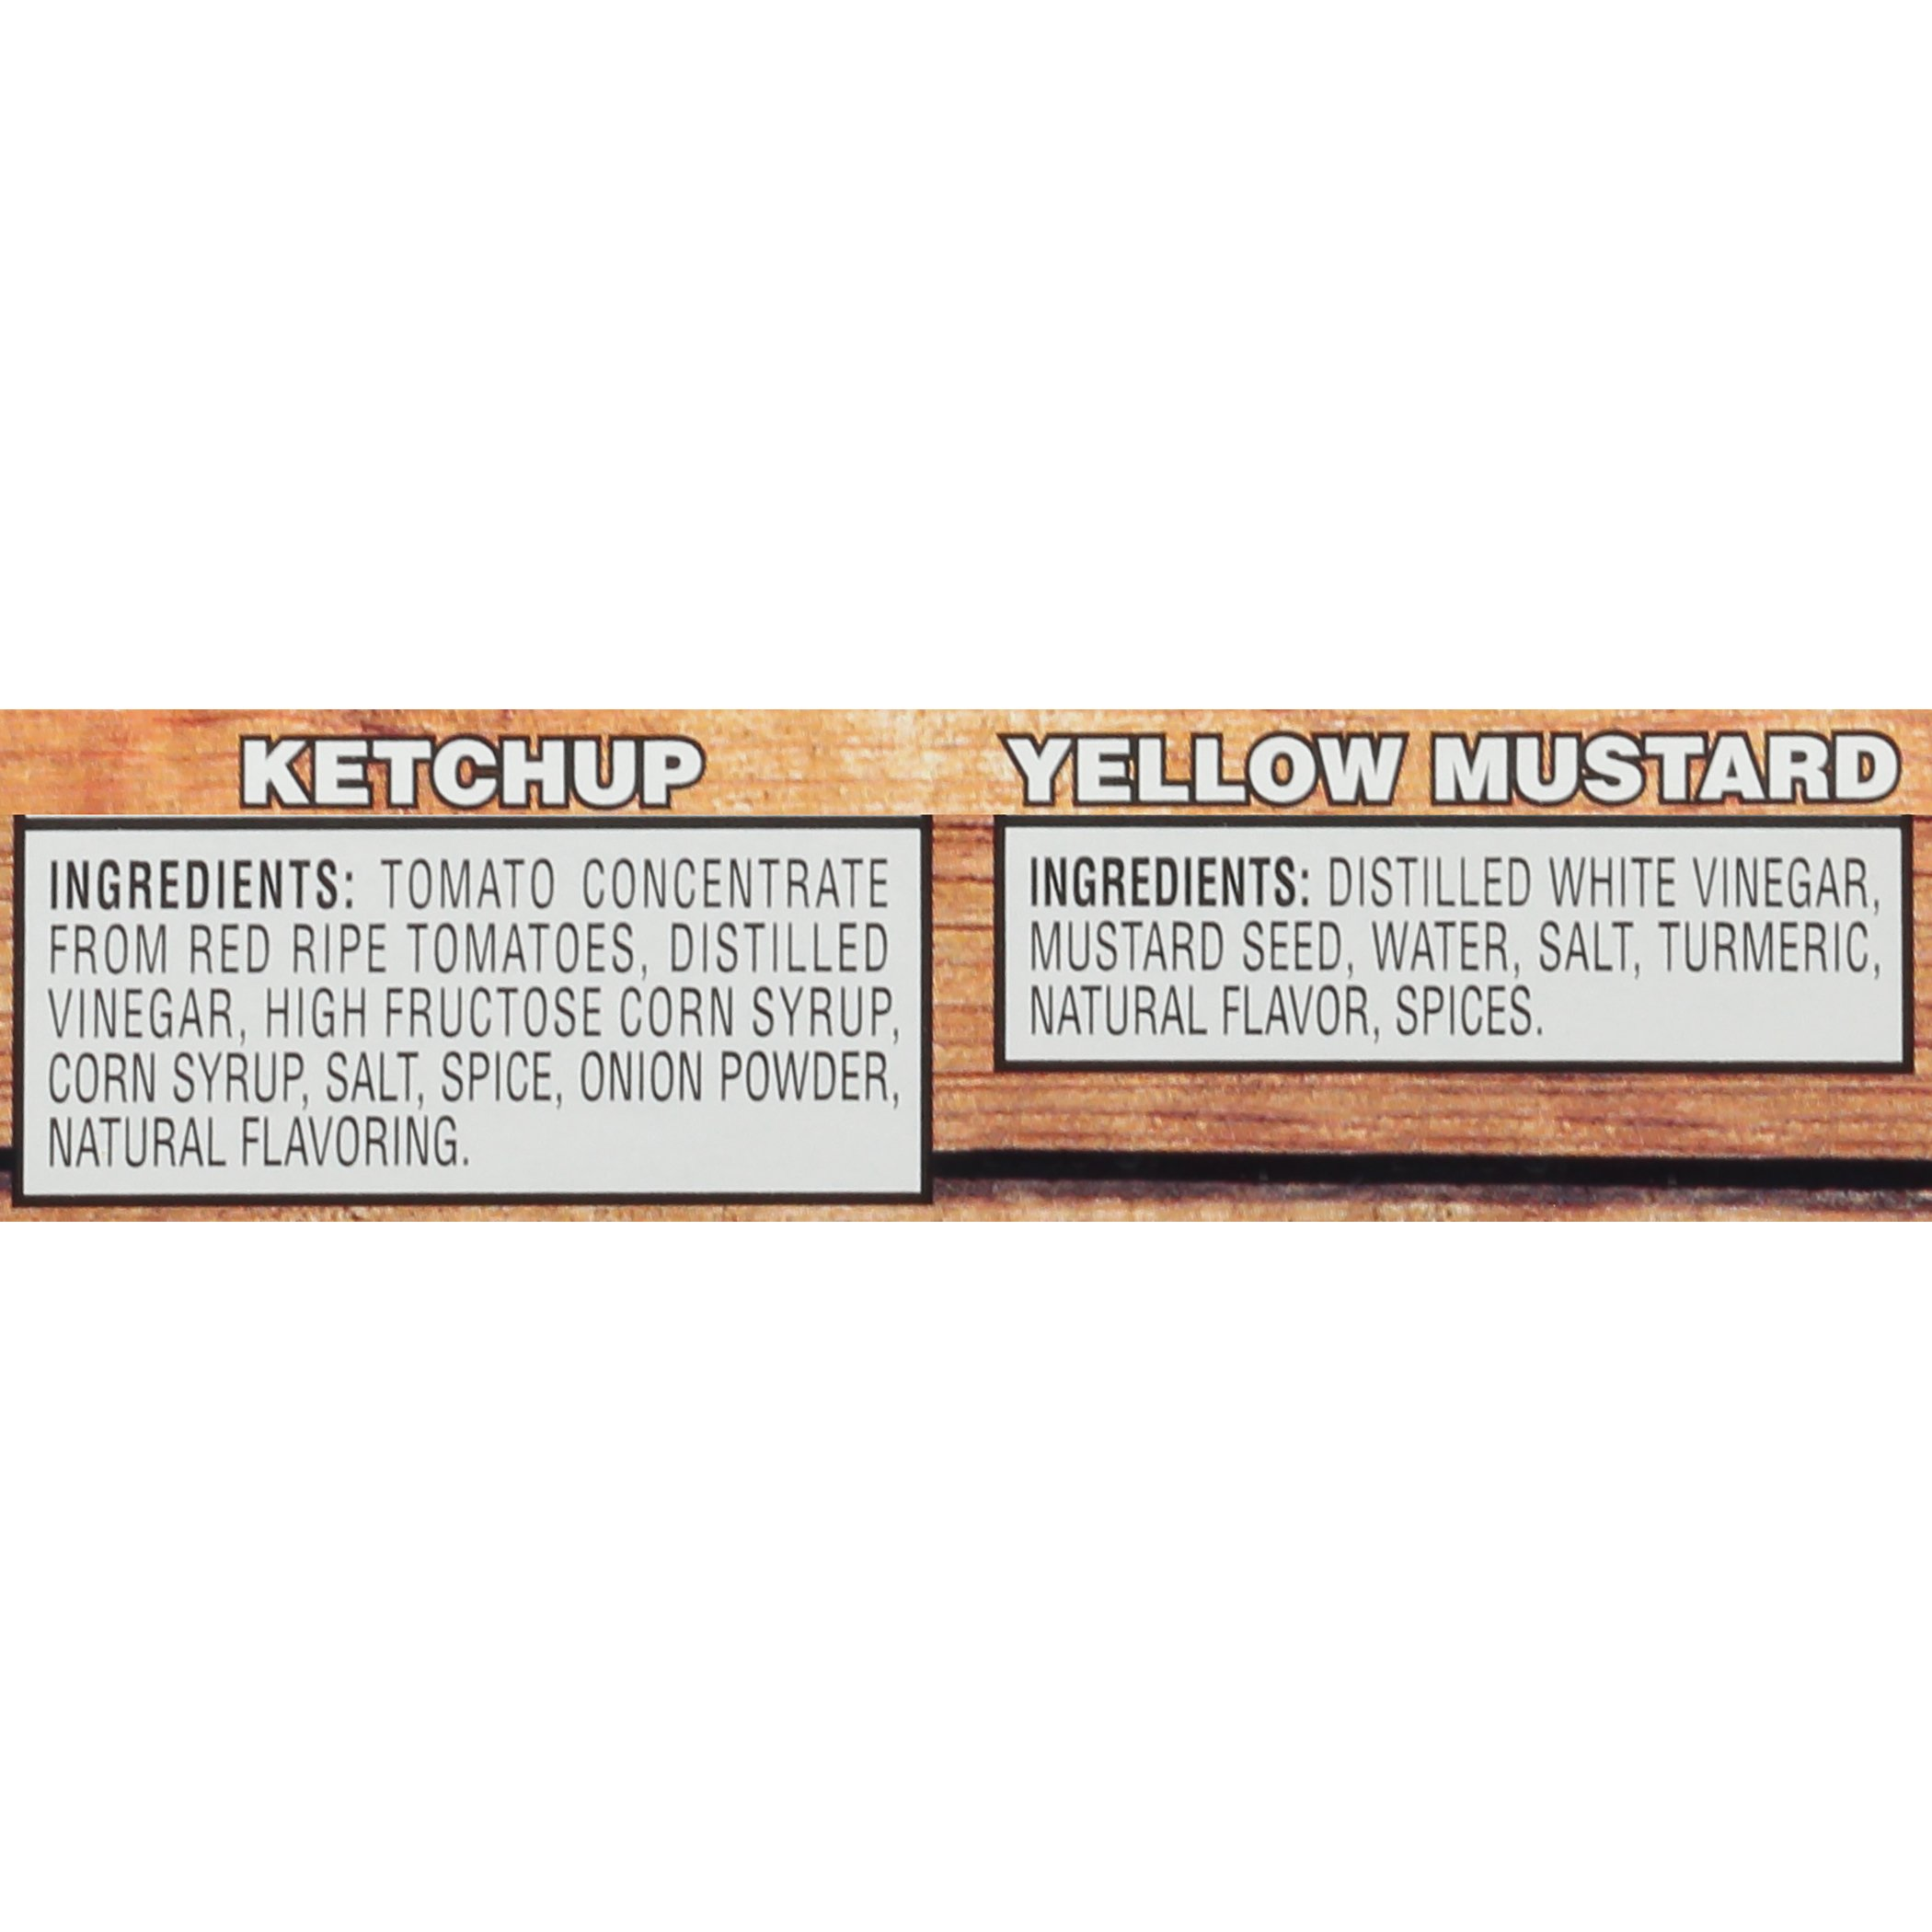 Heinz Ketchup & Yellow Mustard Value Pack, 20 Ounce